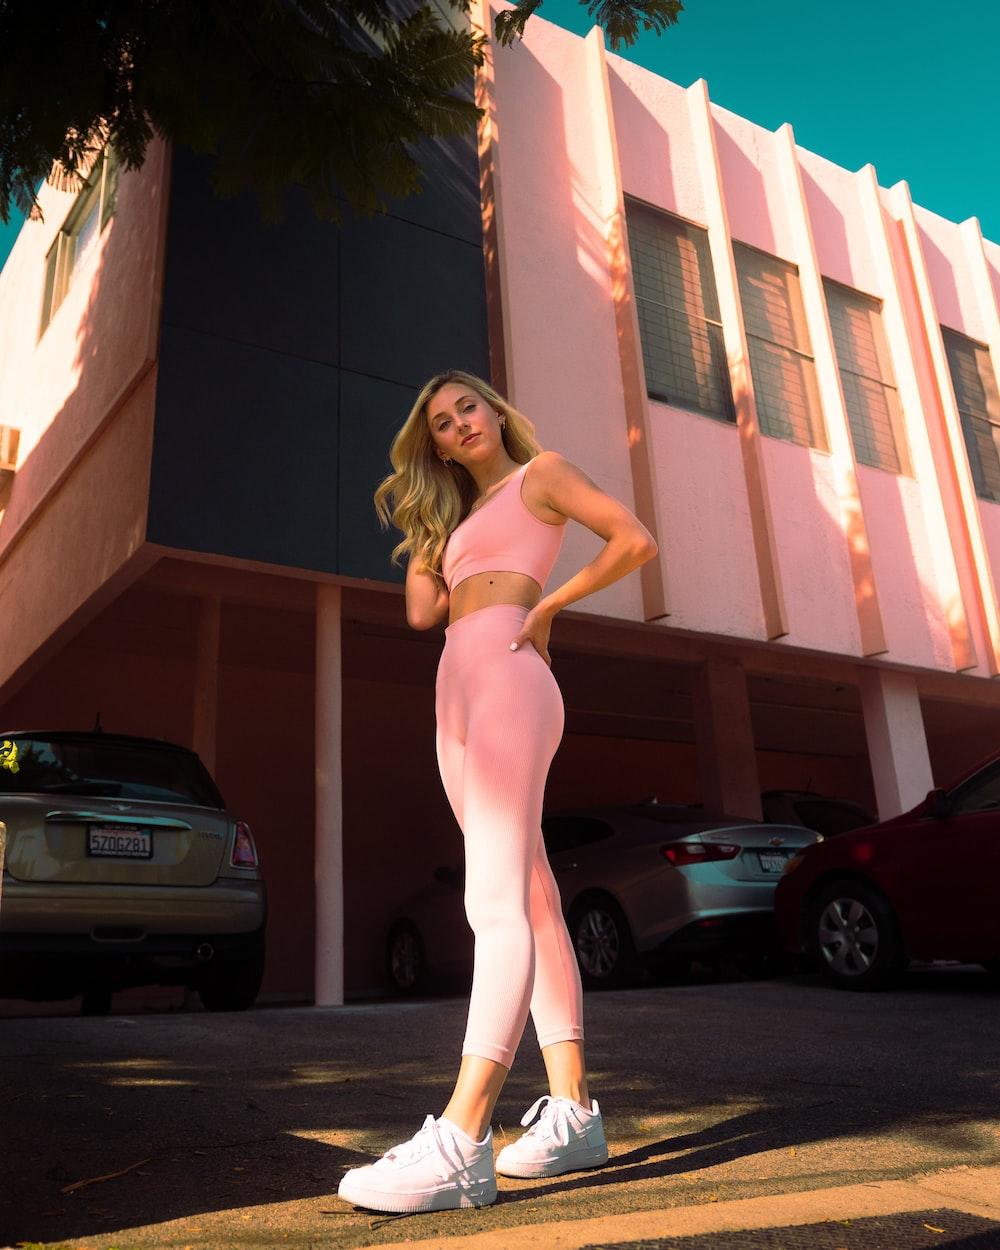 woman in white bikini standing on sidewalk during daytime